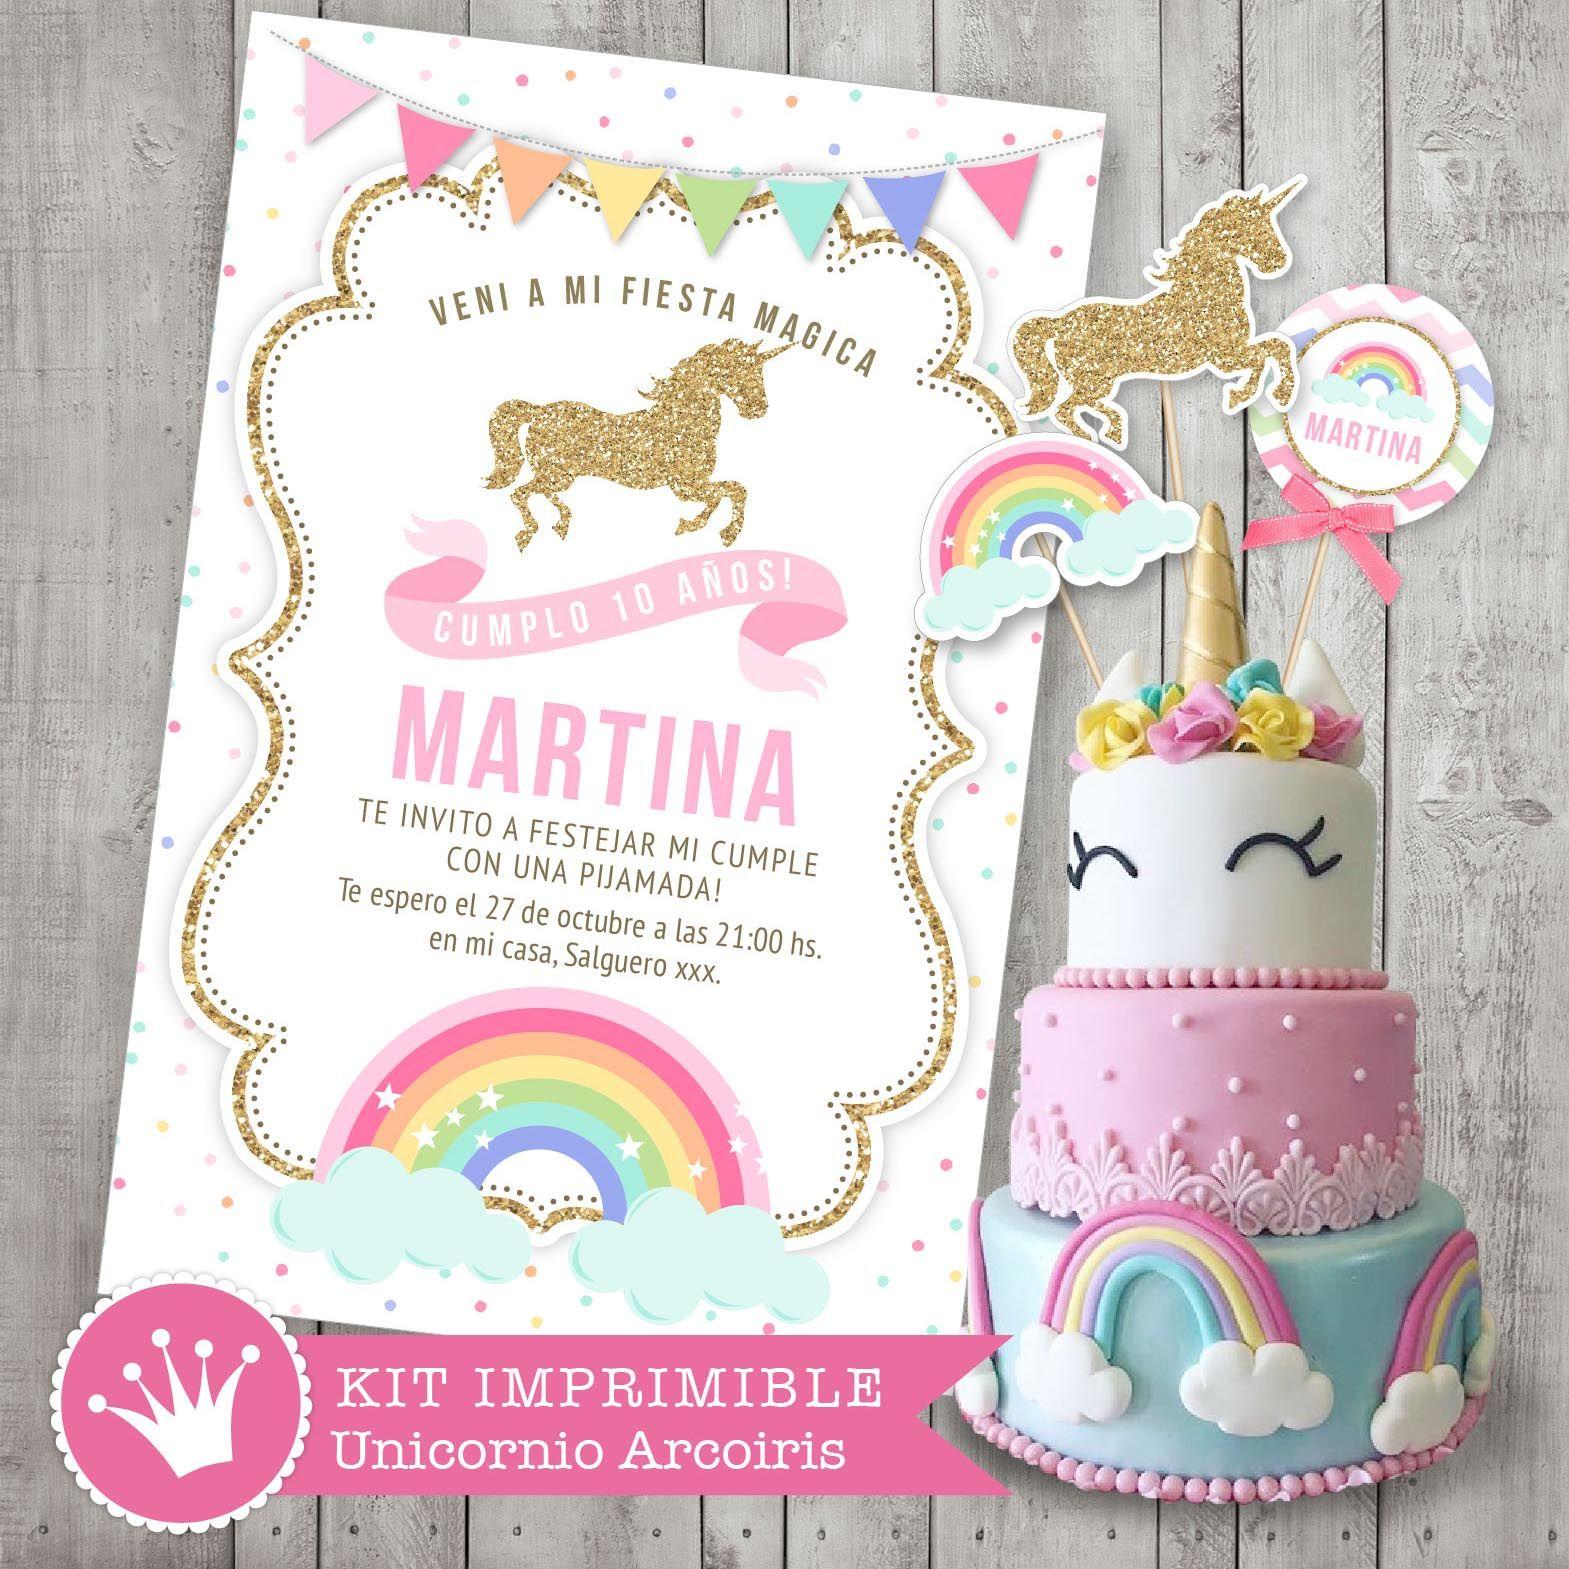 Kit imprimible unicornio y arcoiris decoraci n para - Estilo shabby chic decoracion ...